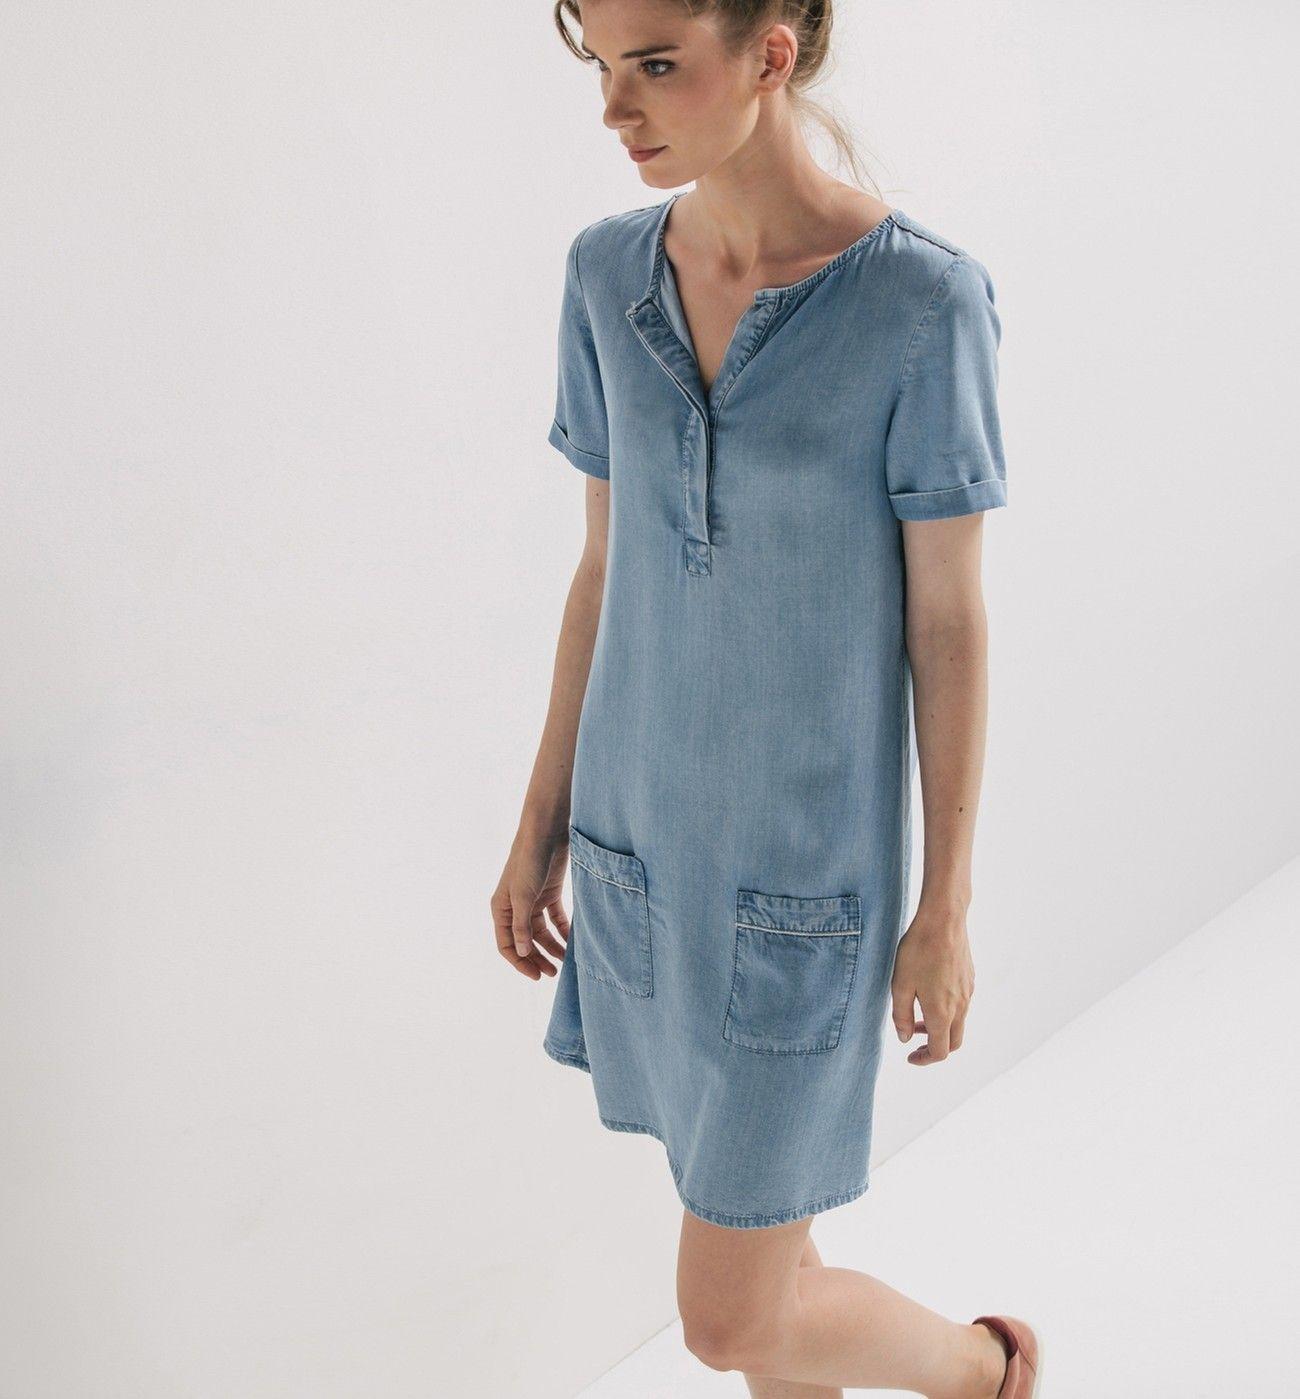 Robe en denim light Femme - Jean moyen - Robes - Femme - Promod ... a5be5823d6c6